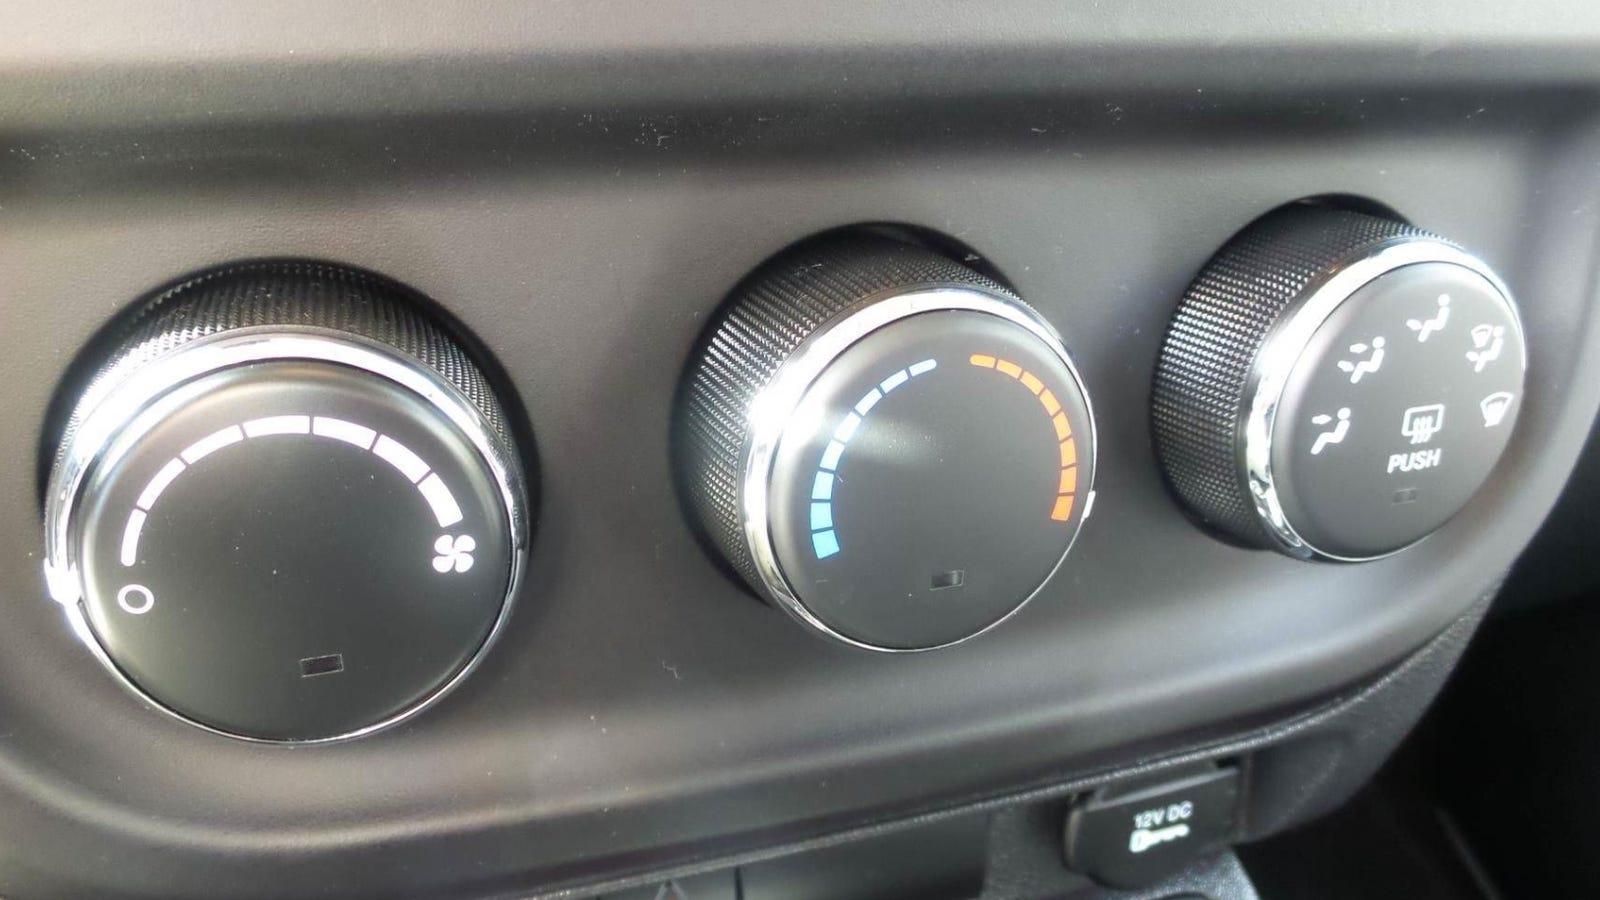 car no air conditioner. car no air conditioner s